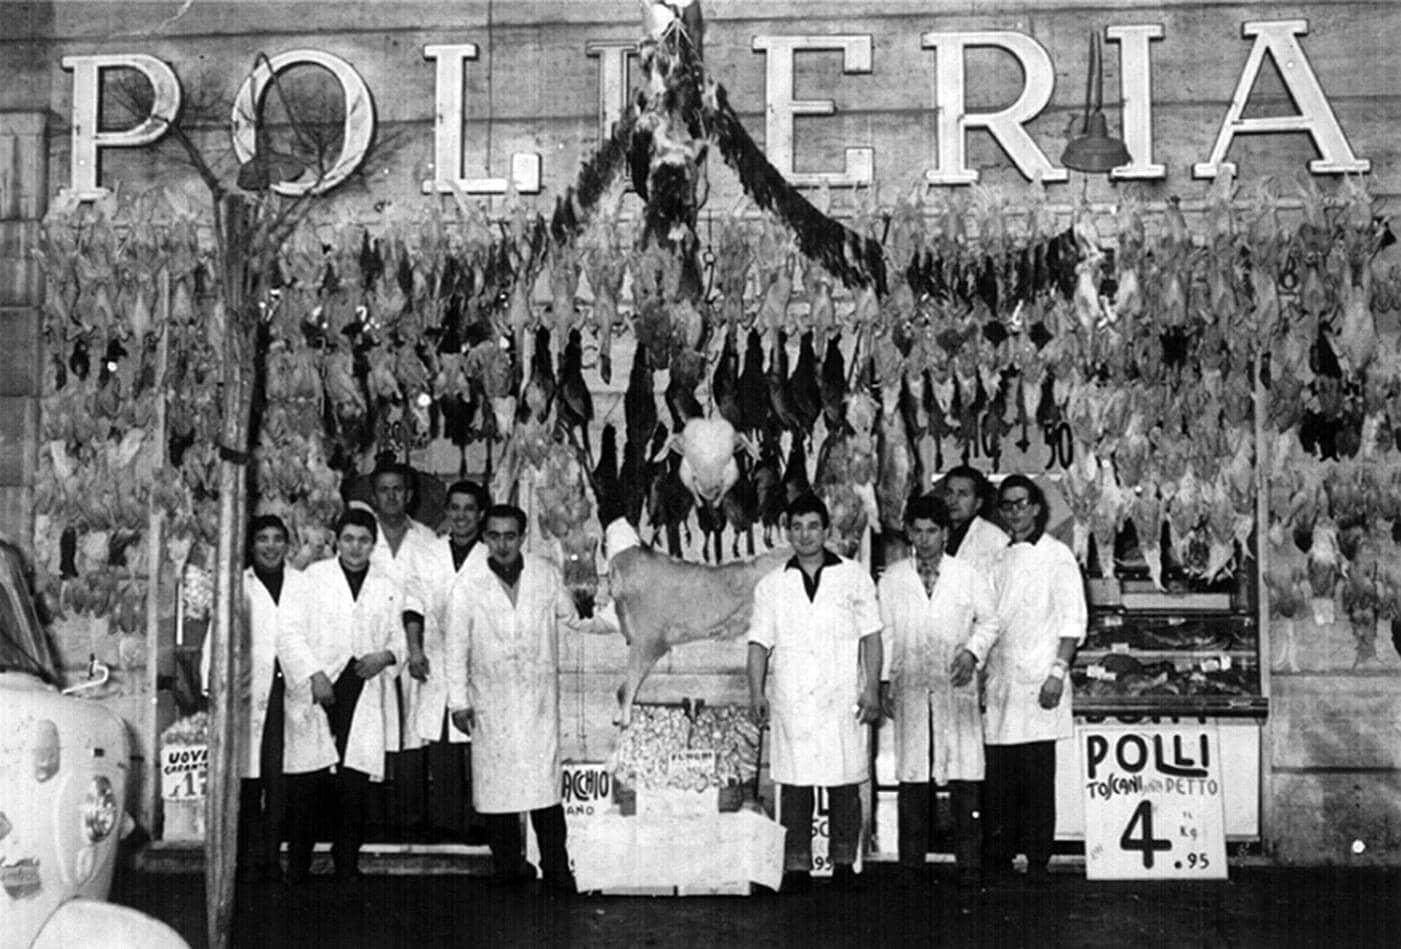 Gruppo Galli Story